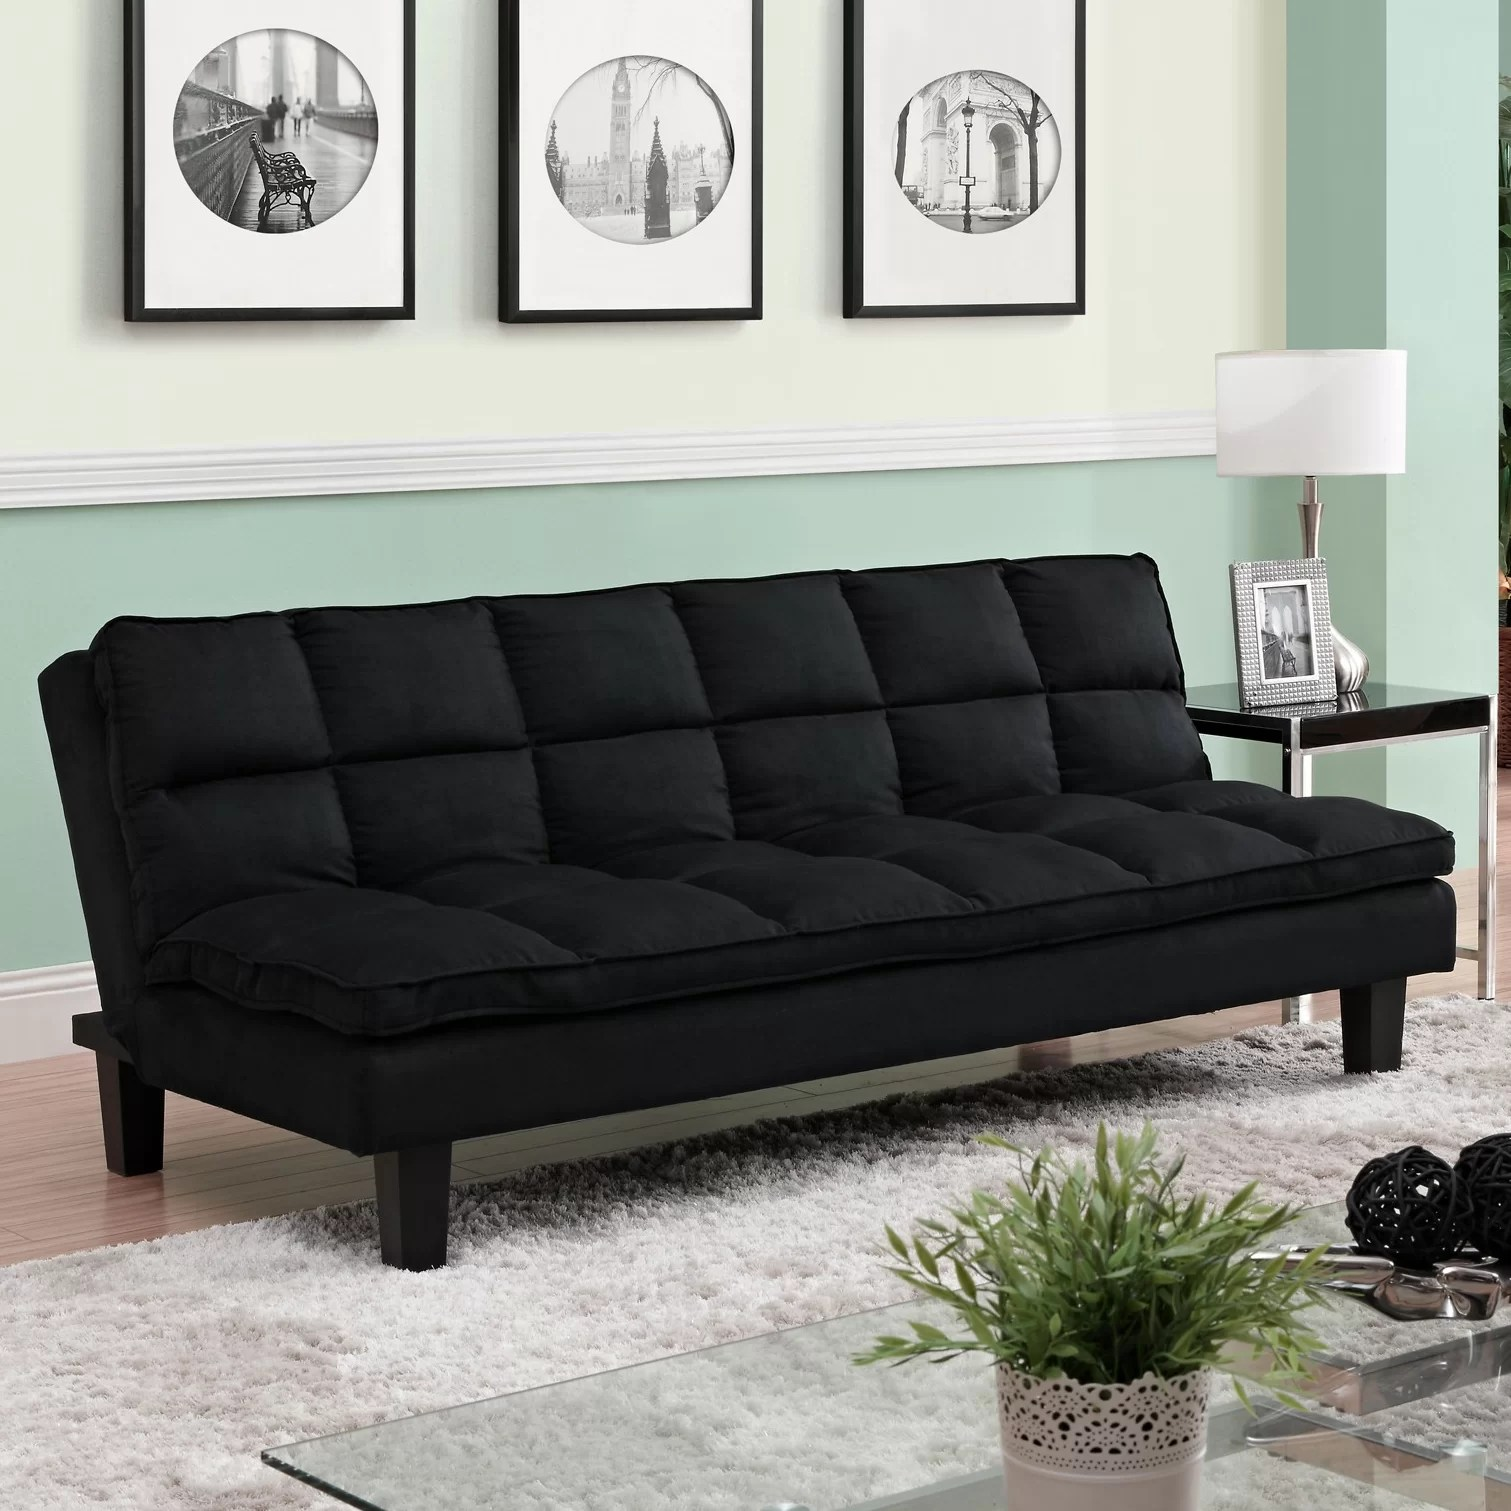 dhp allegra pillow top futon sofa bed how to build frame zipcode design carissa and mattress